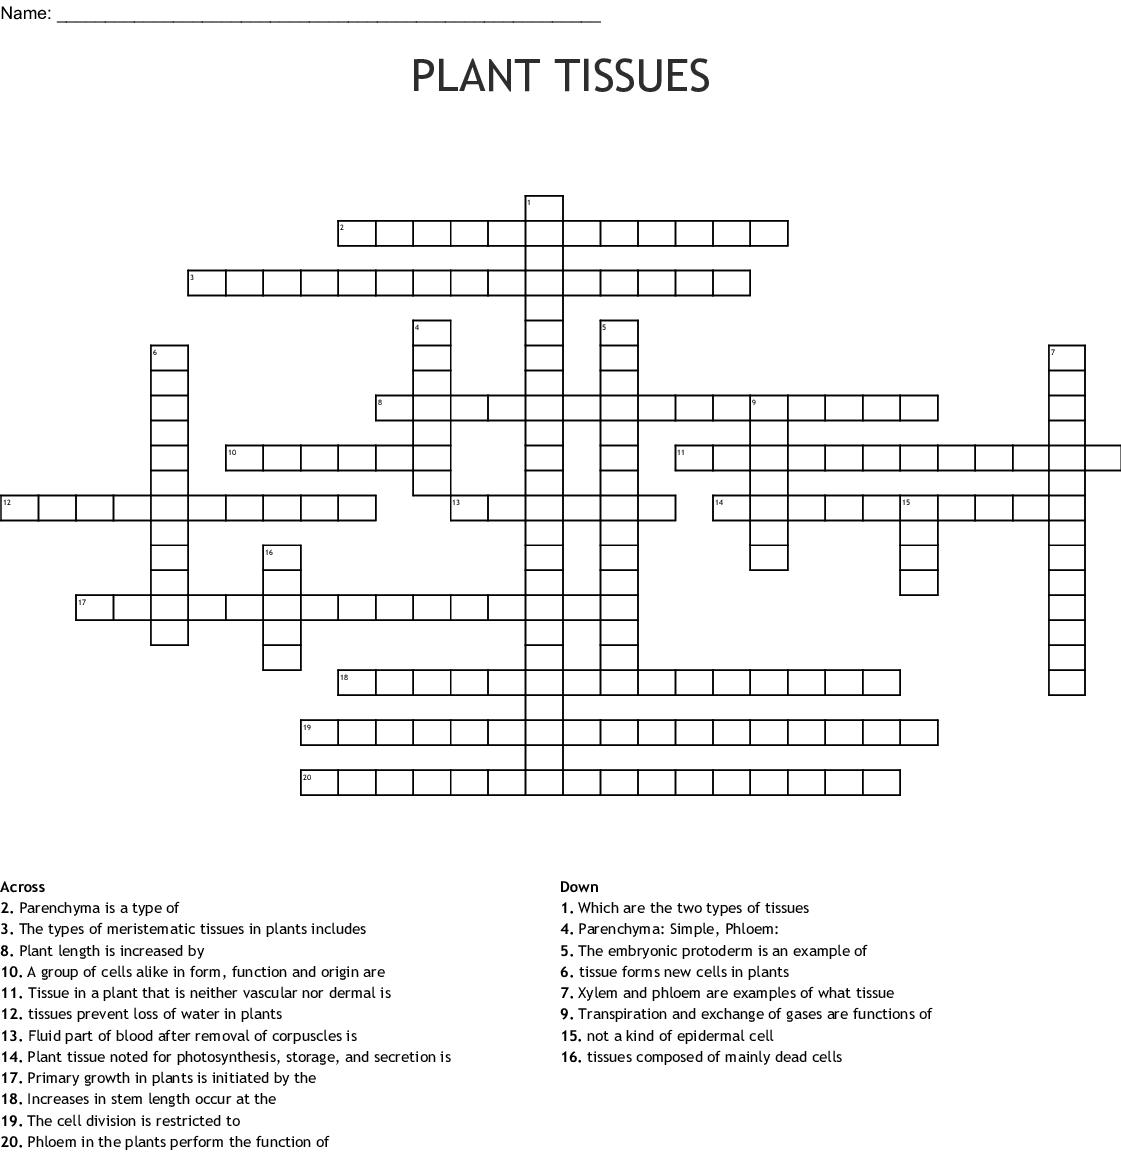 Plant Tissues Crossword